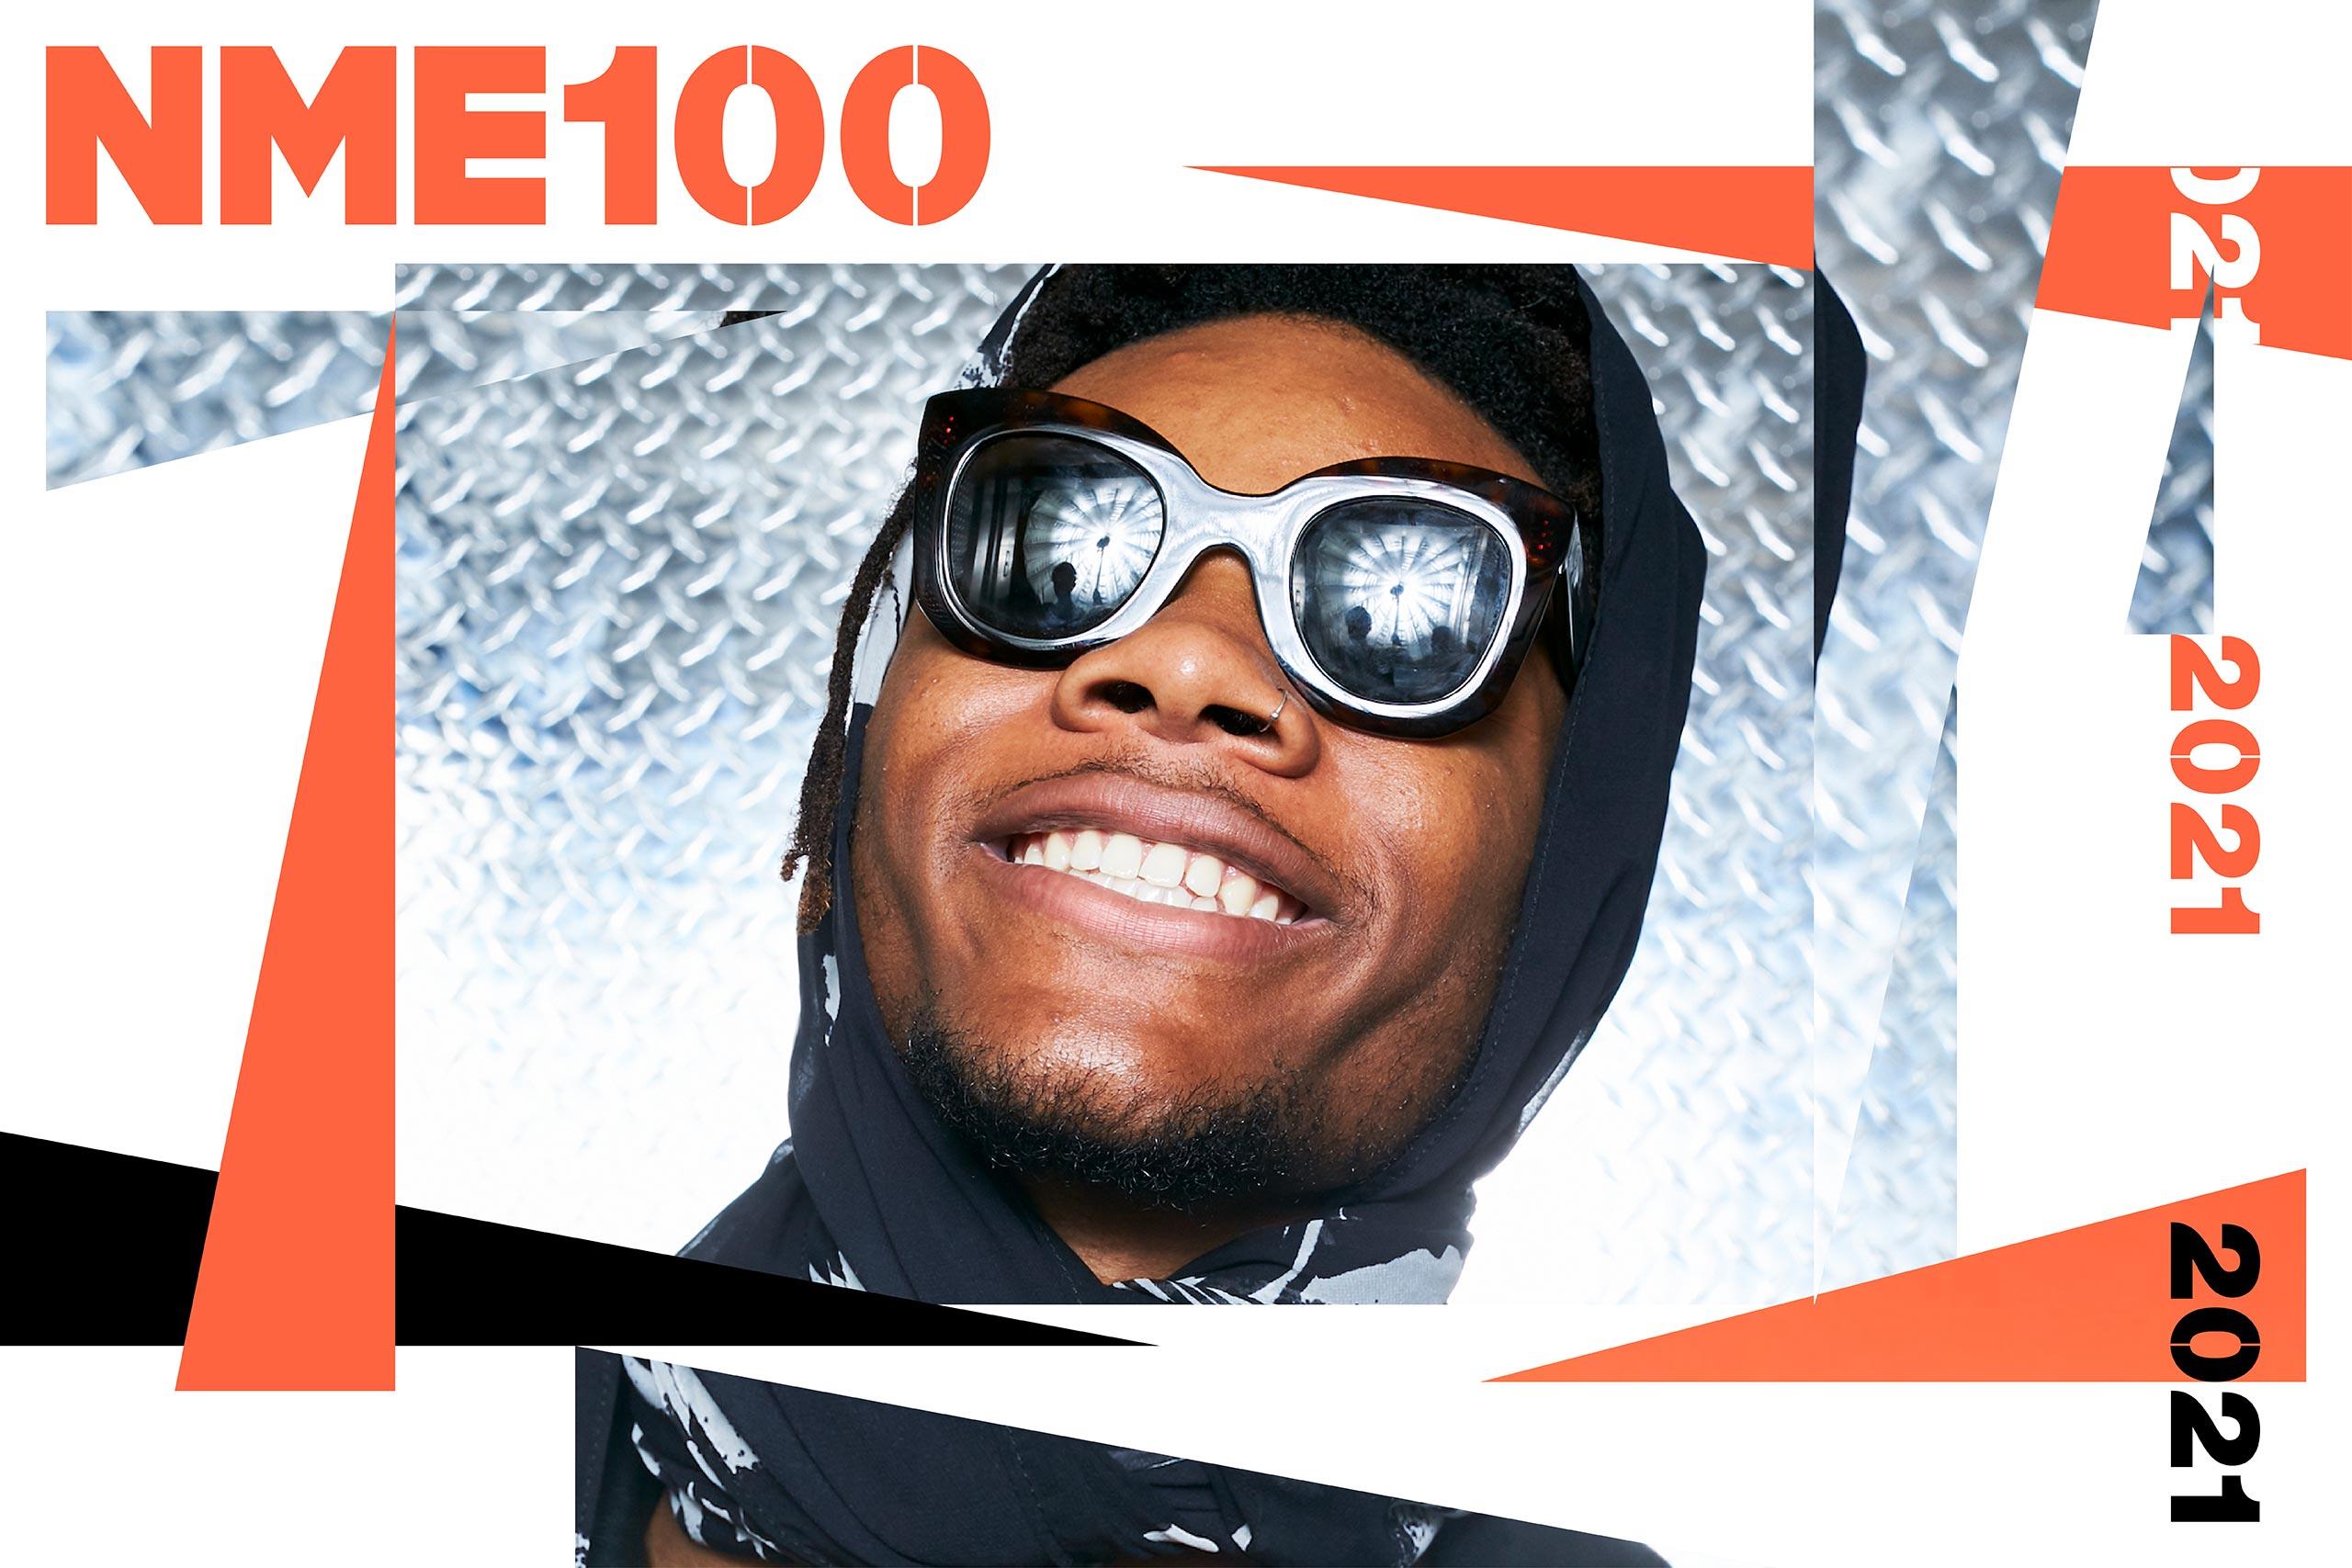 NME 100 hollow sinatra